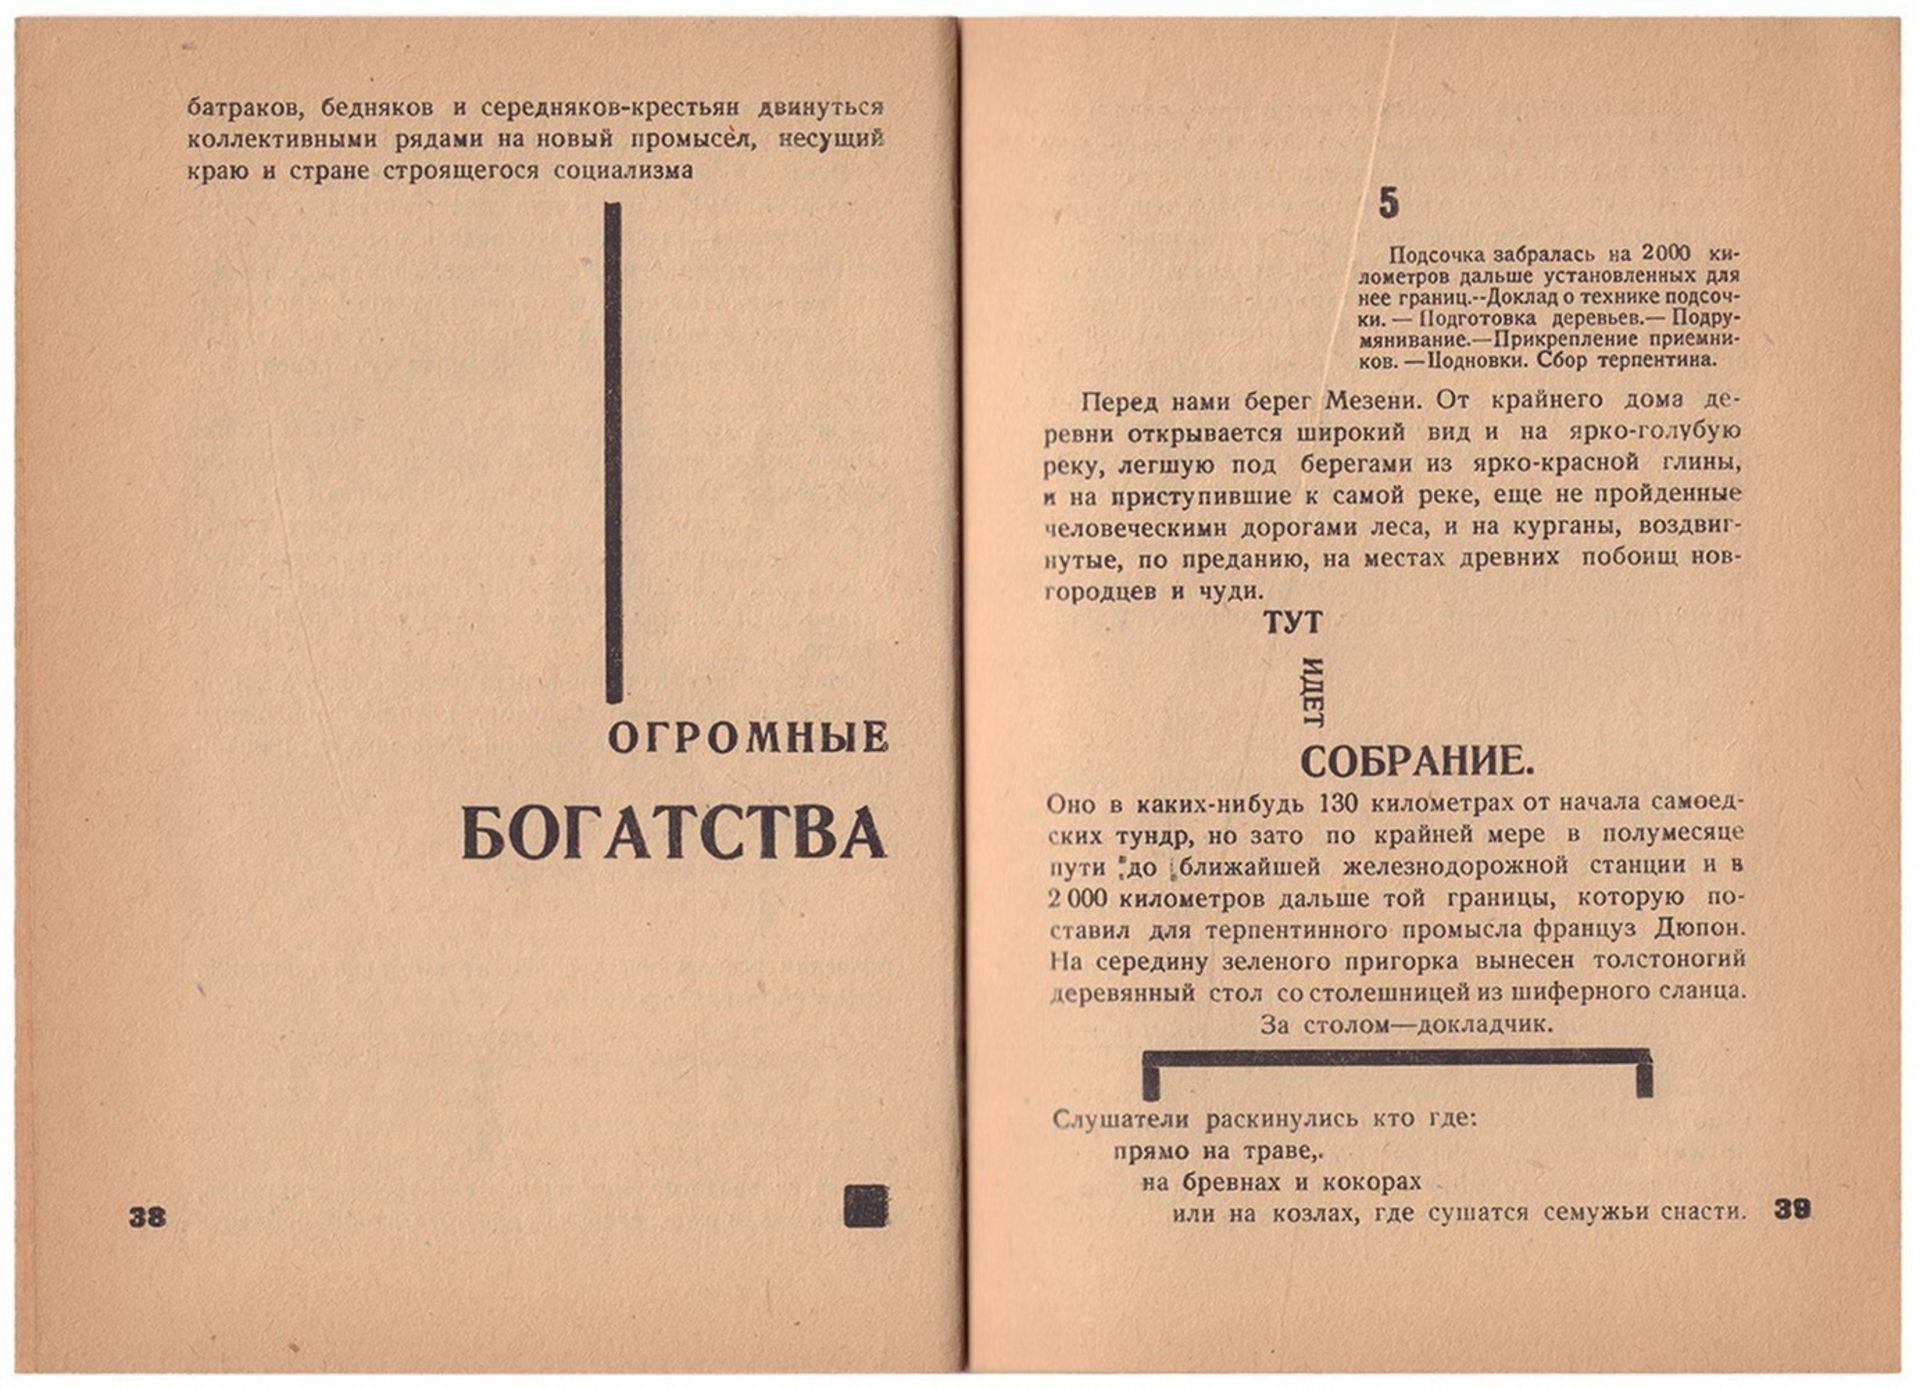 [Soviet art]. Ievlev, S. Our north Turpentine / S.F. Ievlev. - Arkhangelsk, 1931. - 80 pp.: ill.; 29 - Bild 5 aus 6